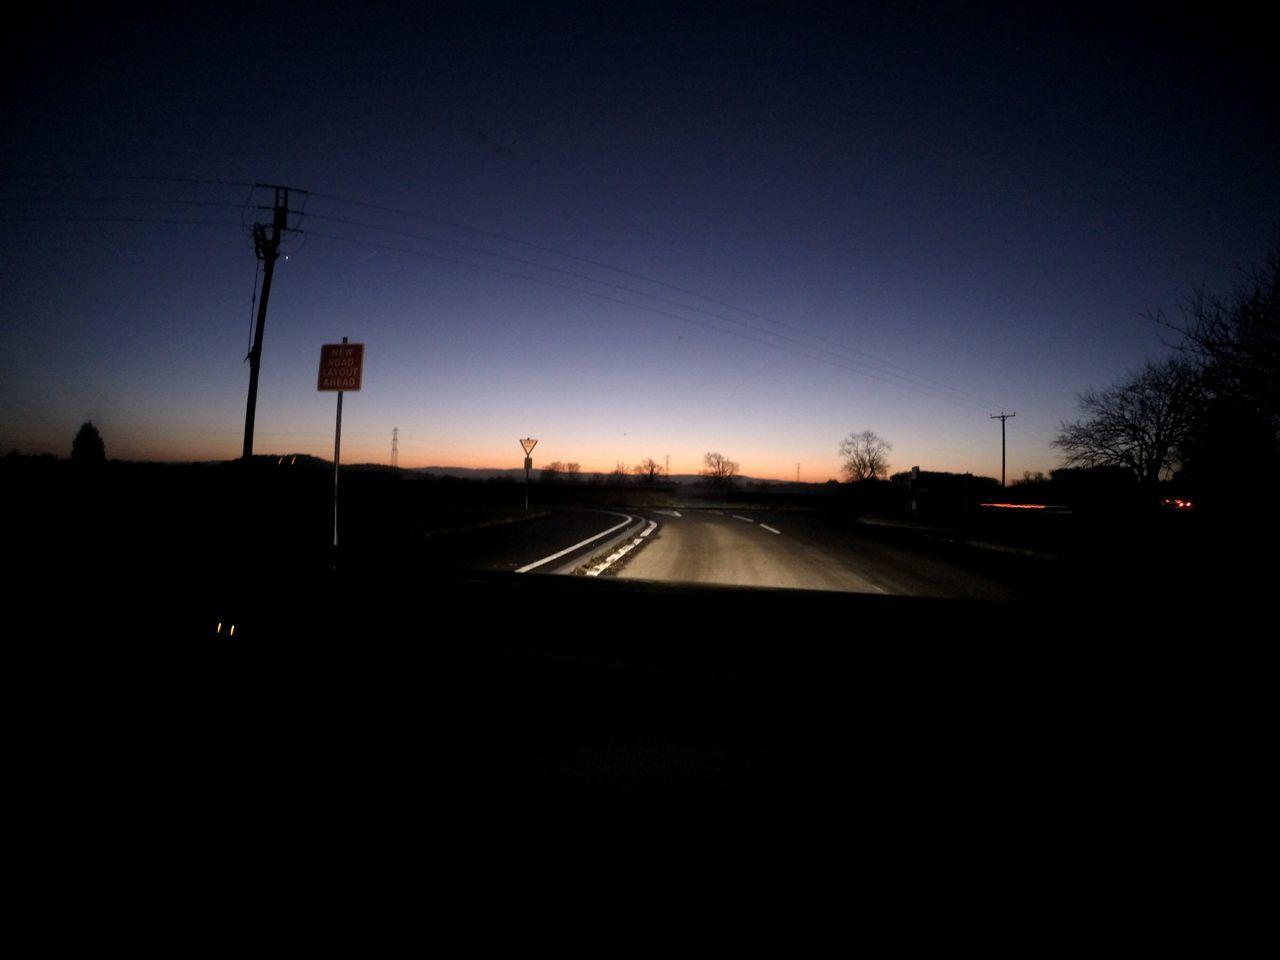 GoPro Hero3+ Night Sunset Sky Road No People Illuminated Transportation NewRoad Bridgewater